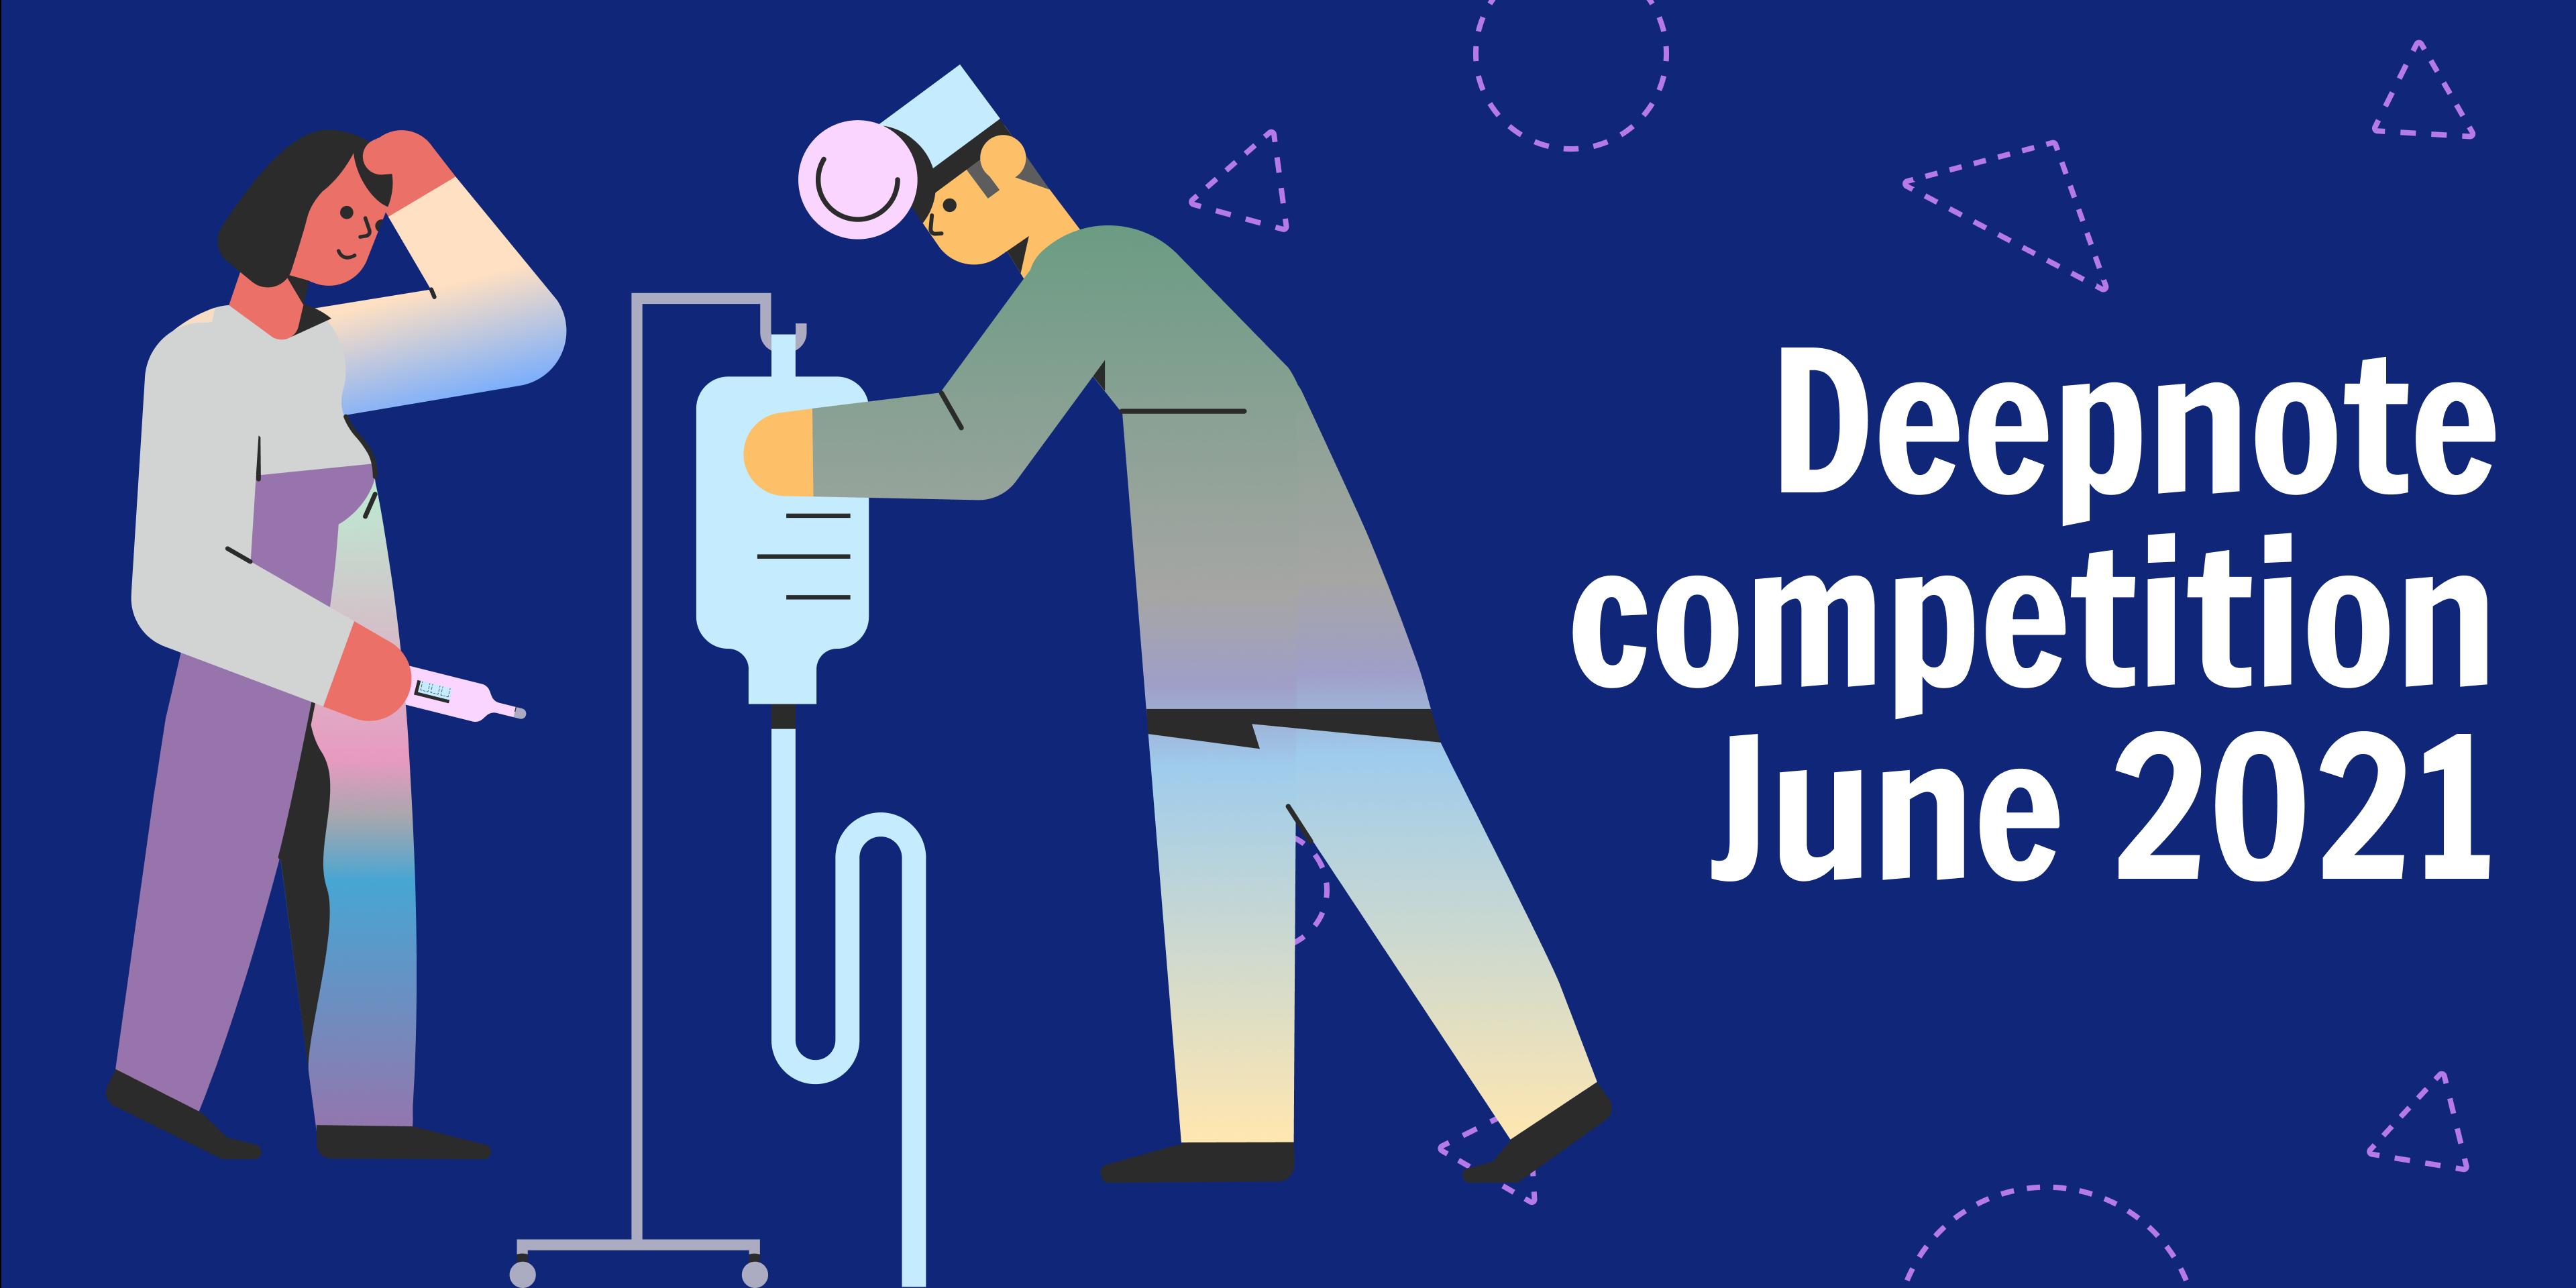 Deepnote competition –June 2021 –image